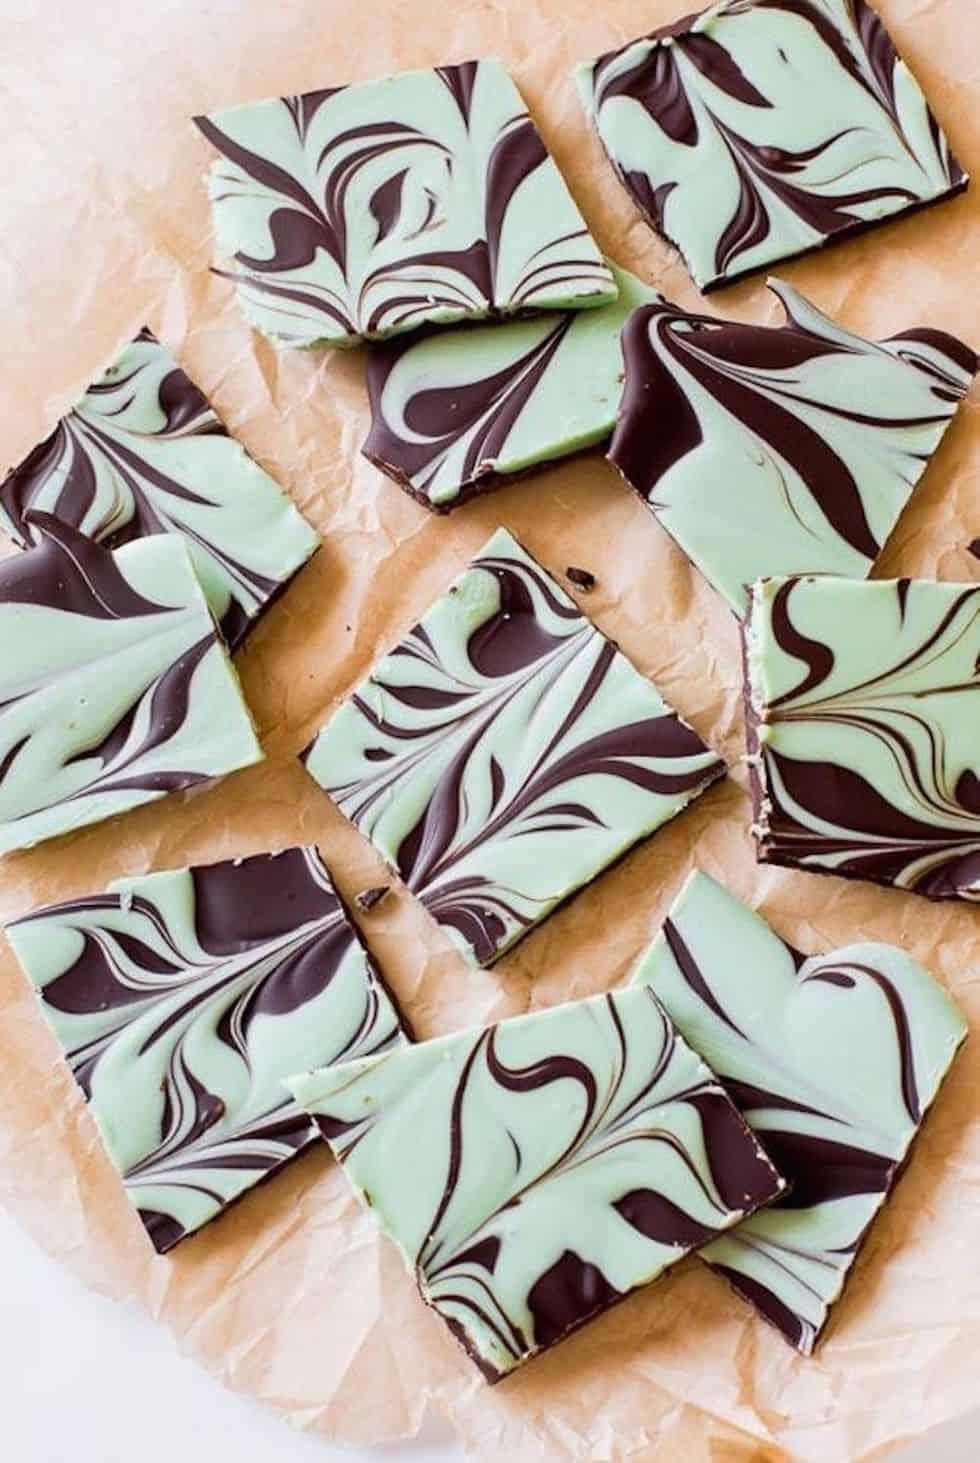 Mint chocolate swirl bark